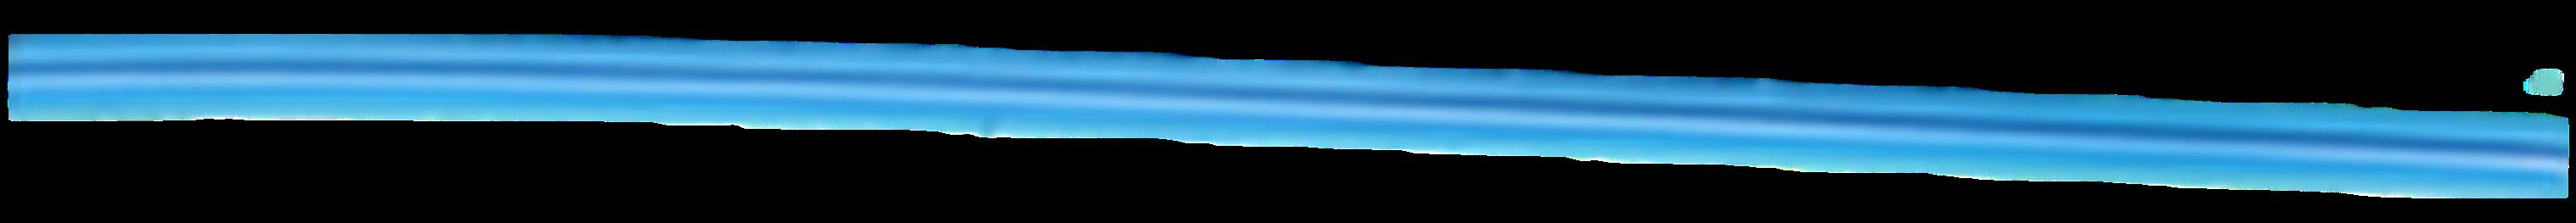 Selekční a označovací páska modrá